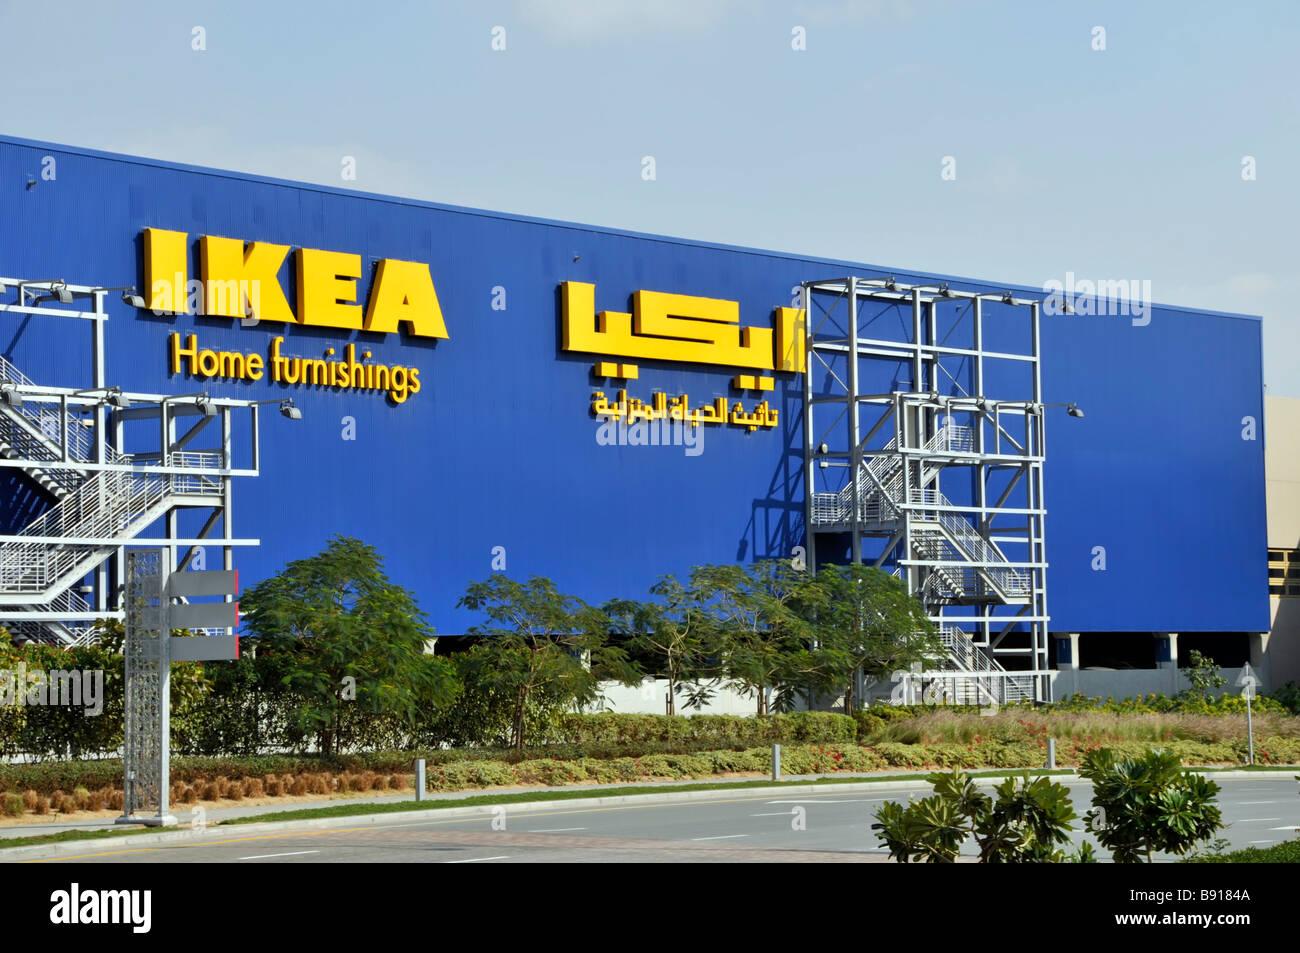 Ikea Home Decor Dubai: Dubai Ikea Home Furnishing Store With Arabic Signs Stock